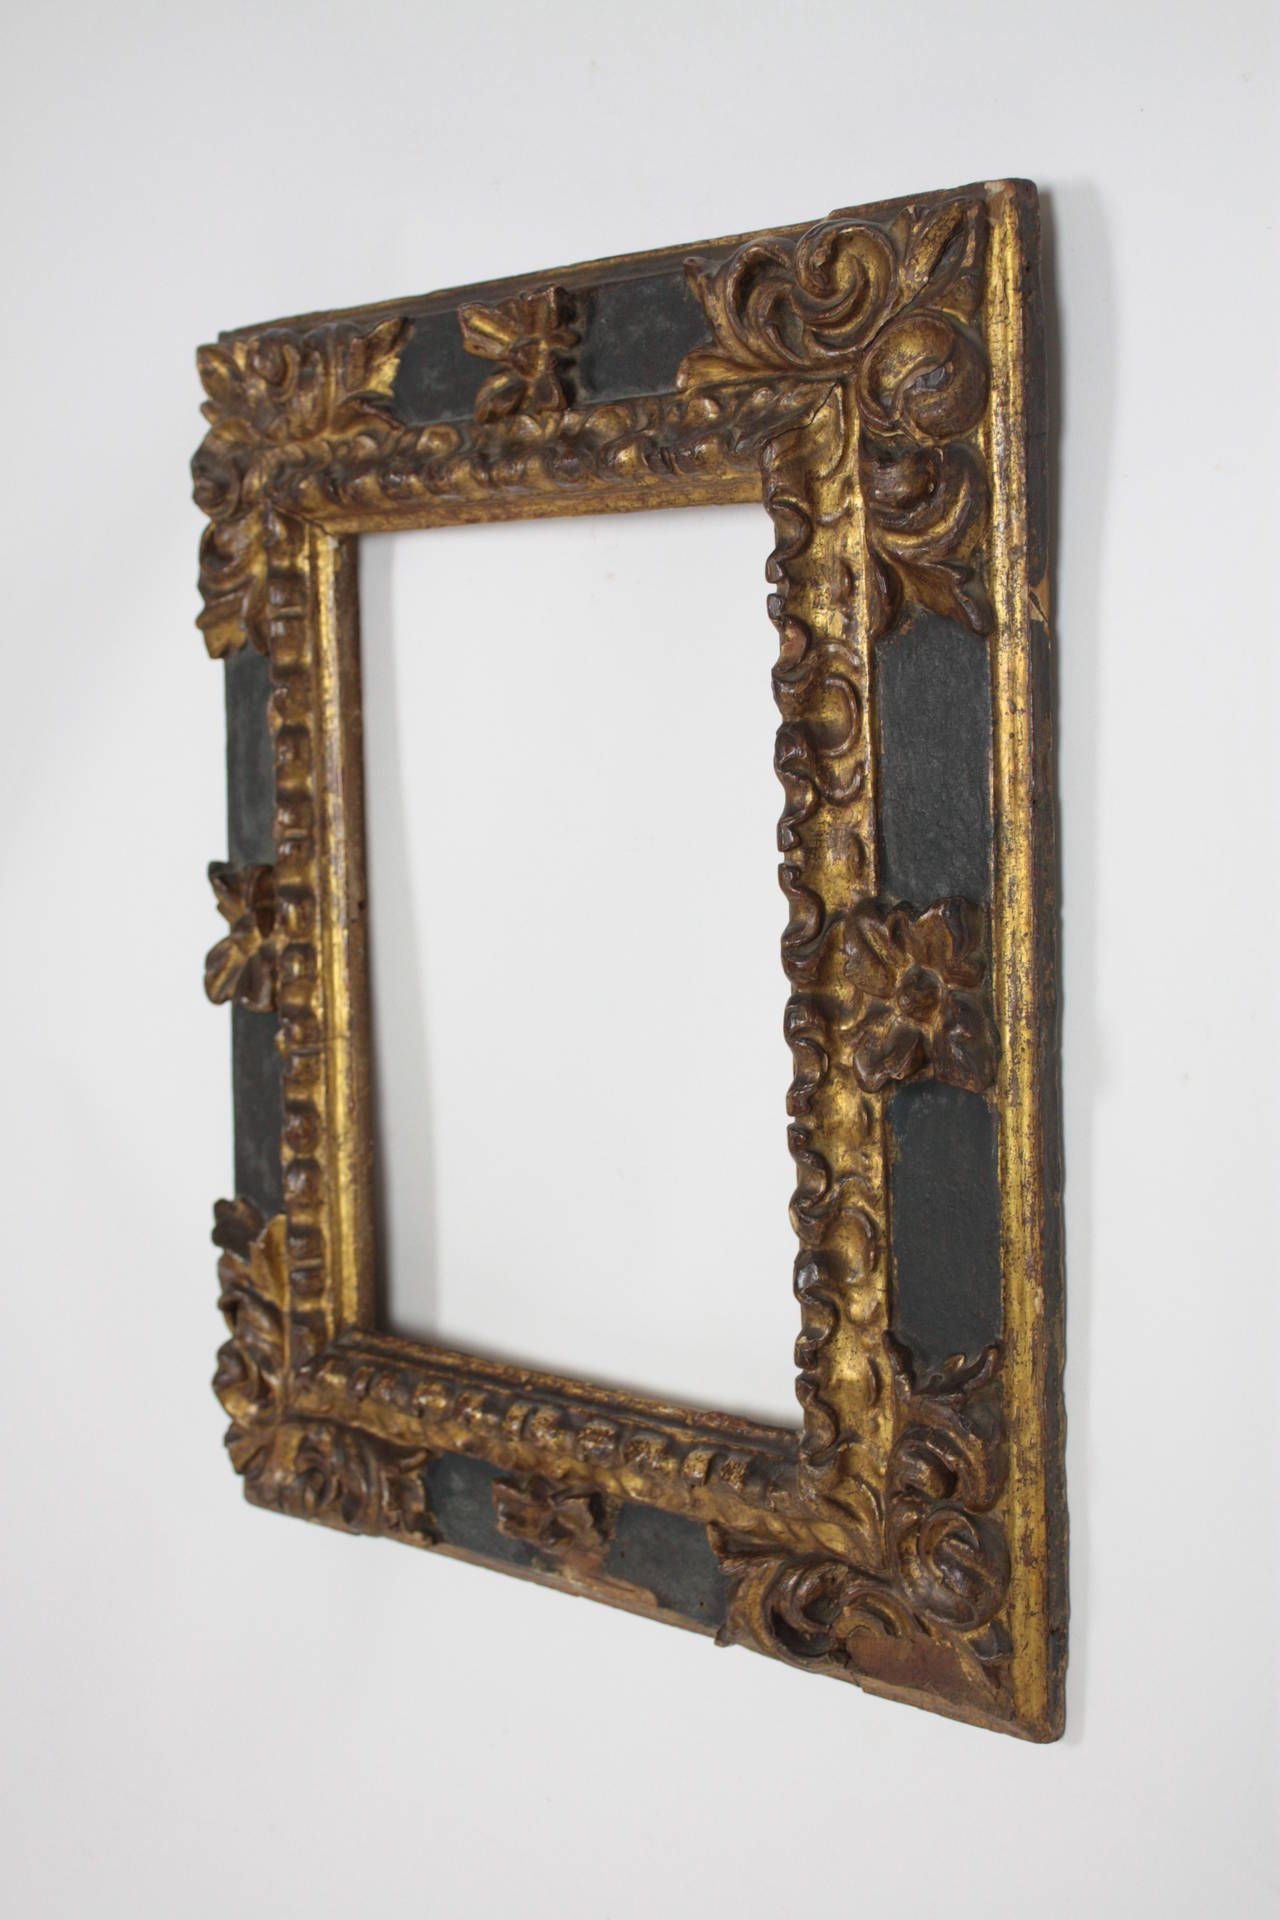 17th Century Spanish Baroque Polychromed Carved Wood Gold Leaf Frame ...